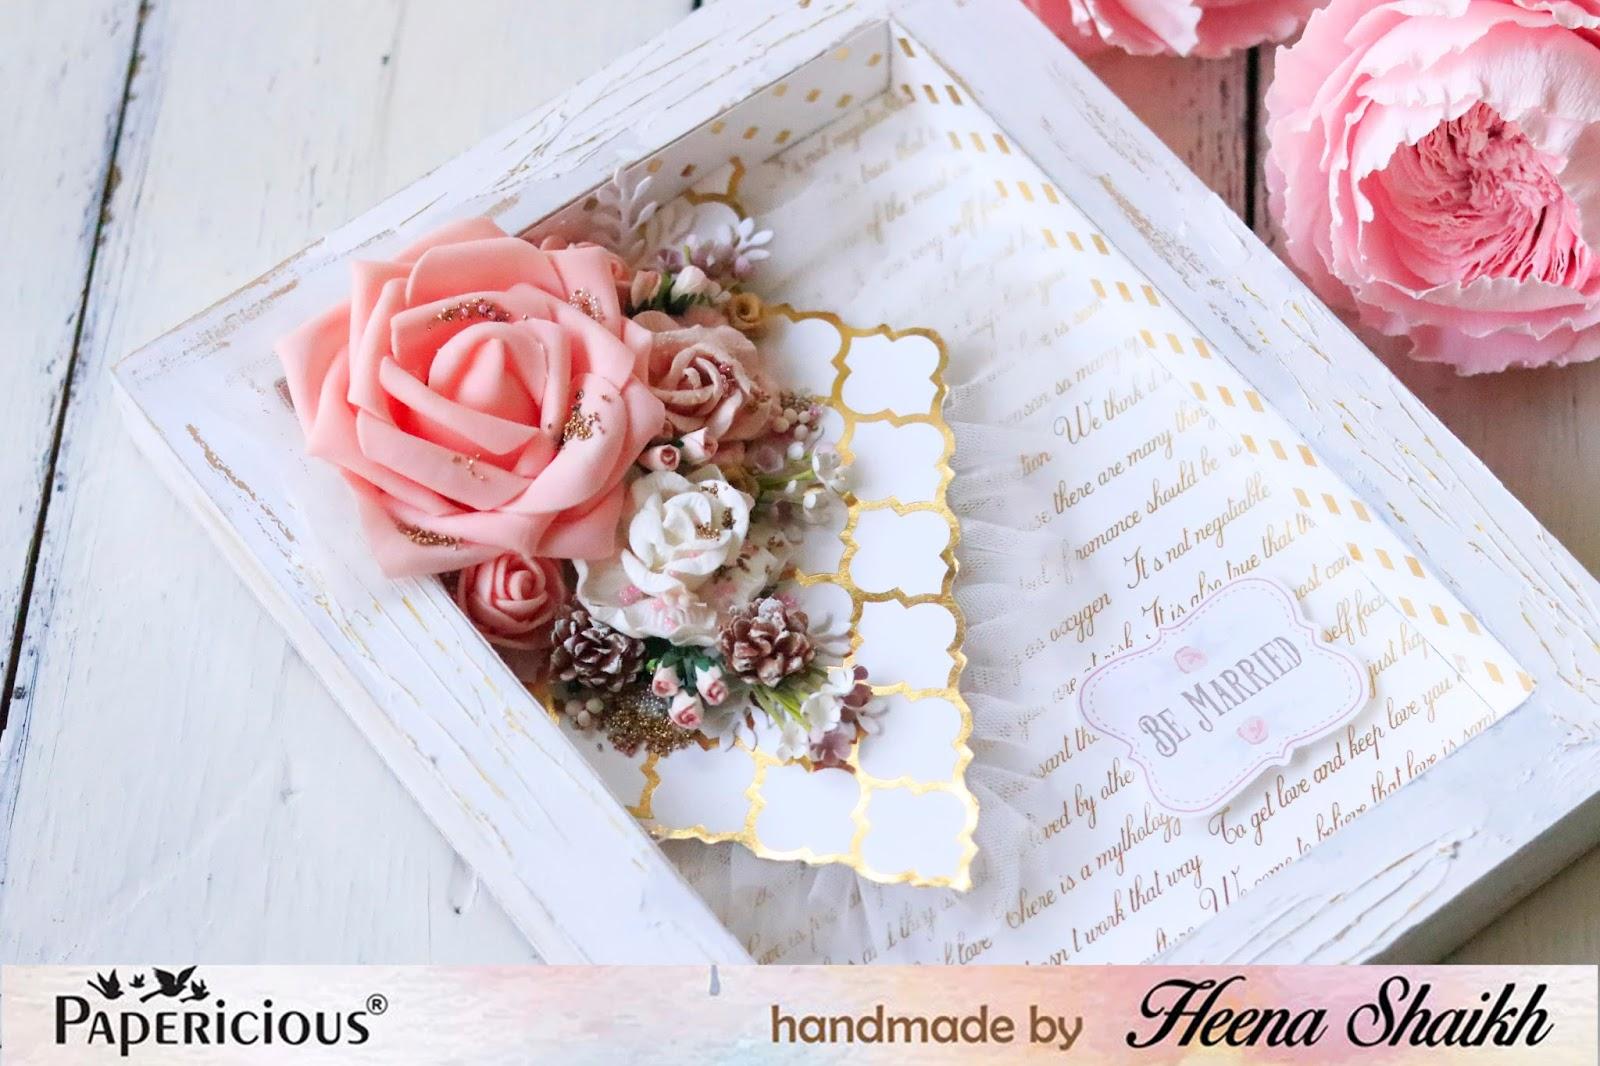 Shabby Chic Wedding Shadow Box | Papericious